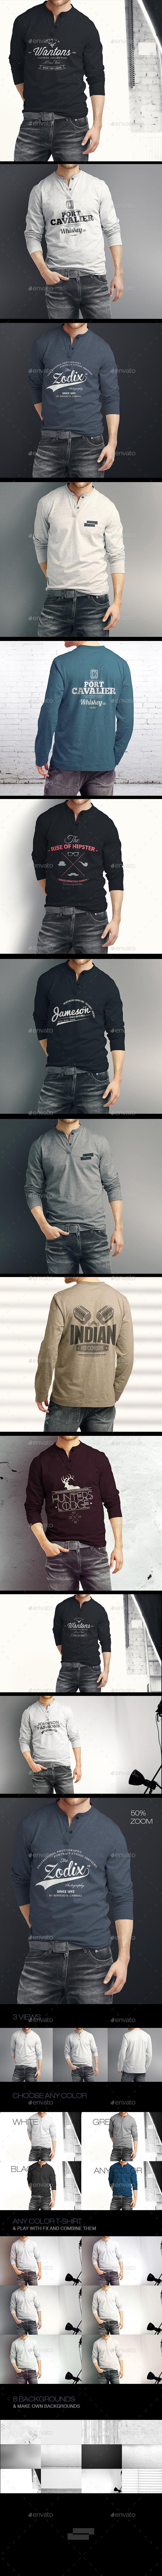 GraphicRiver Man Longsleeve Shirt Mock-up 9610861